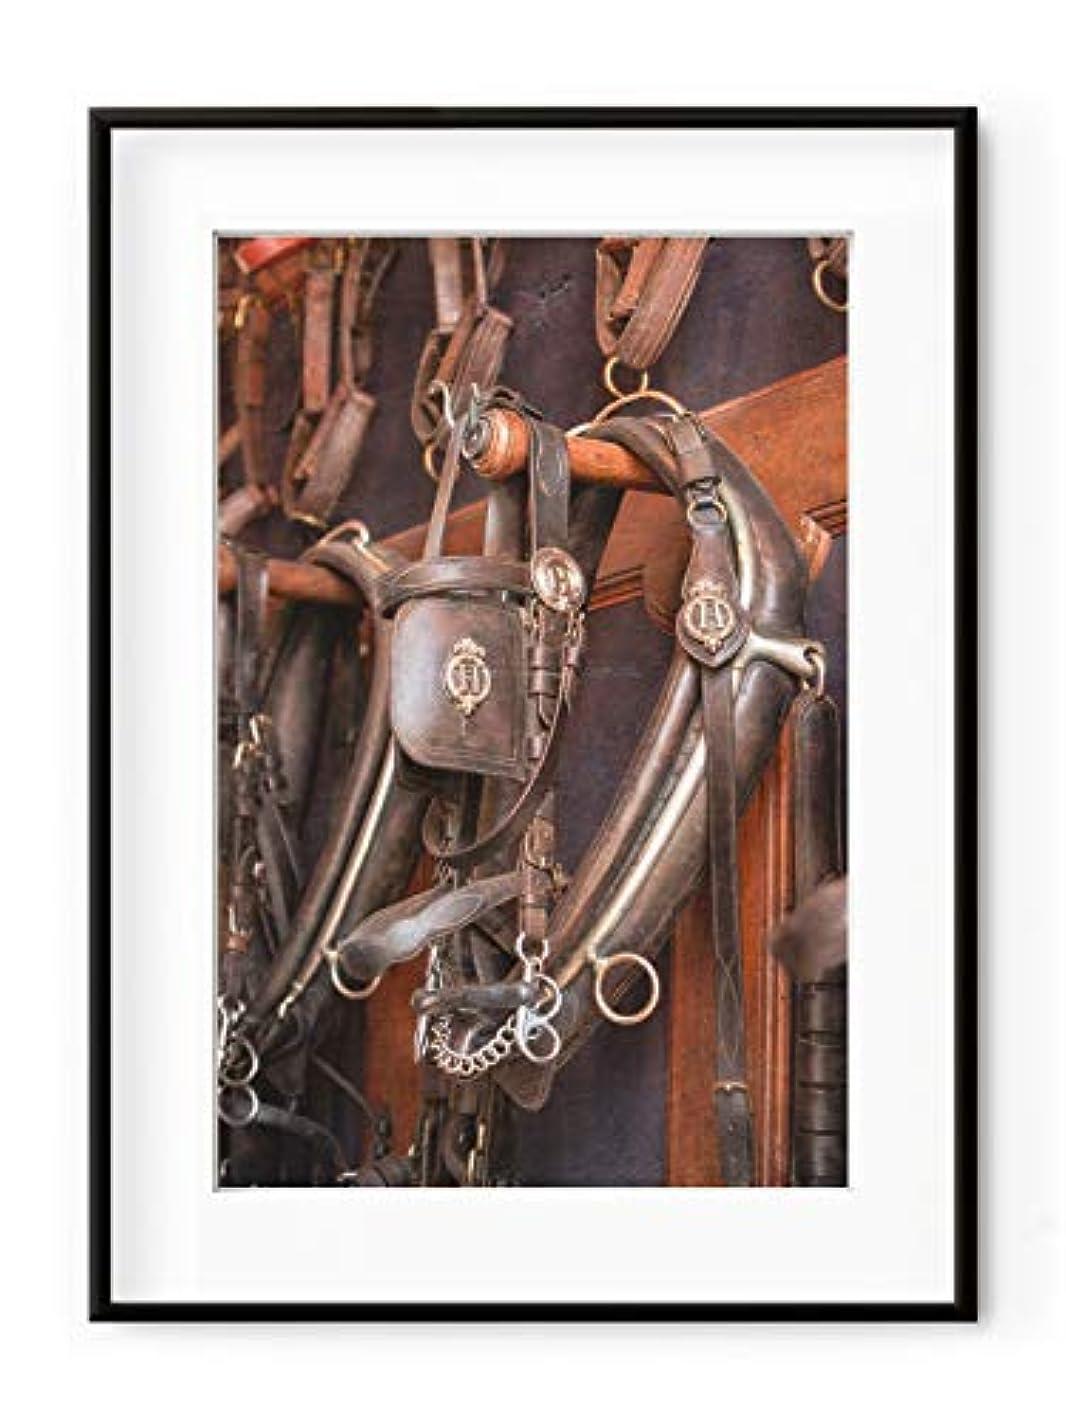 Harnachement du Horse, Black Satin Aluminium Frame, with Mount, Multicolored, 70x100